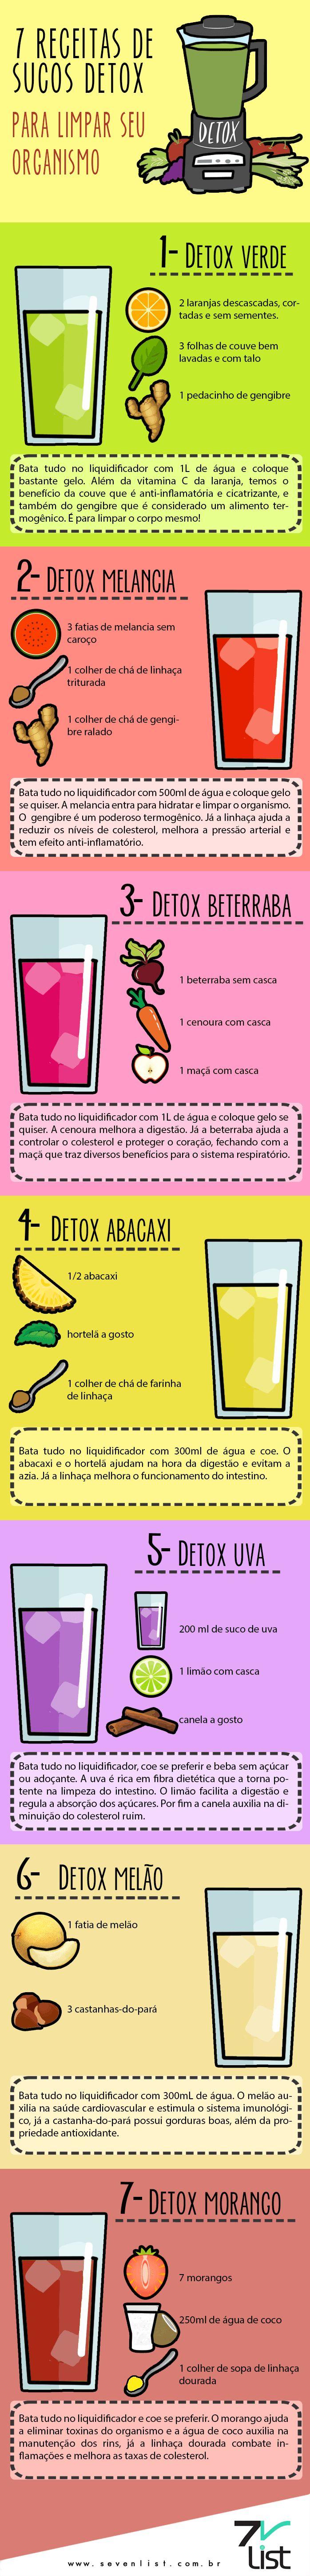 #infográfico #infographic #design #sucos #detox #sucosdetox #juice# #dieta…